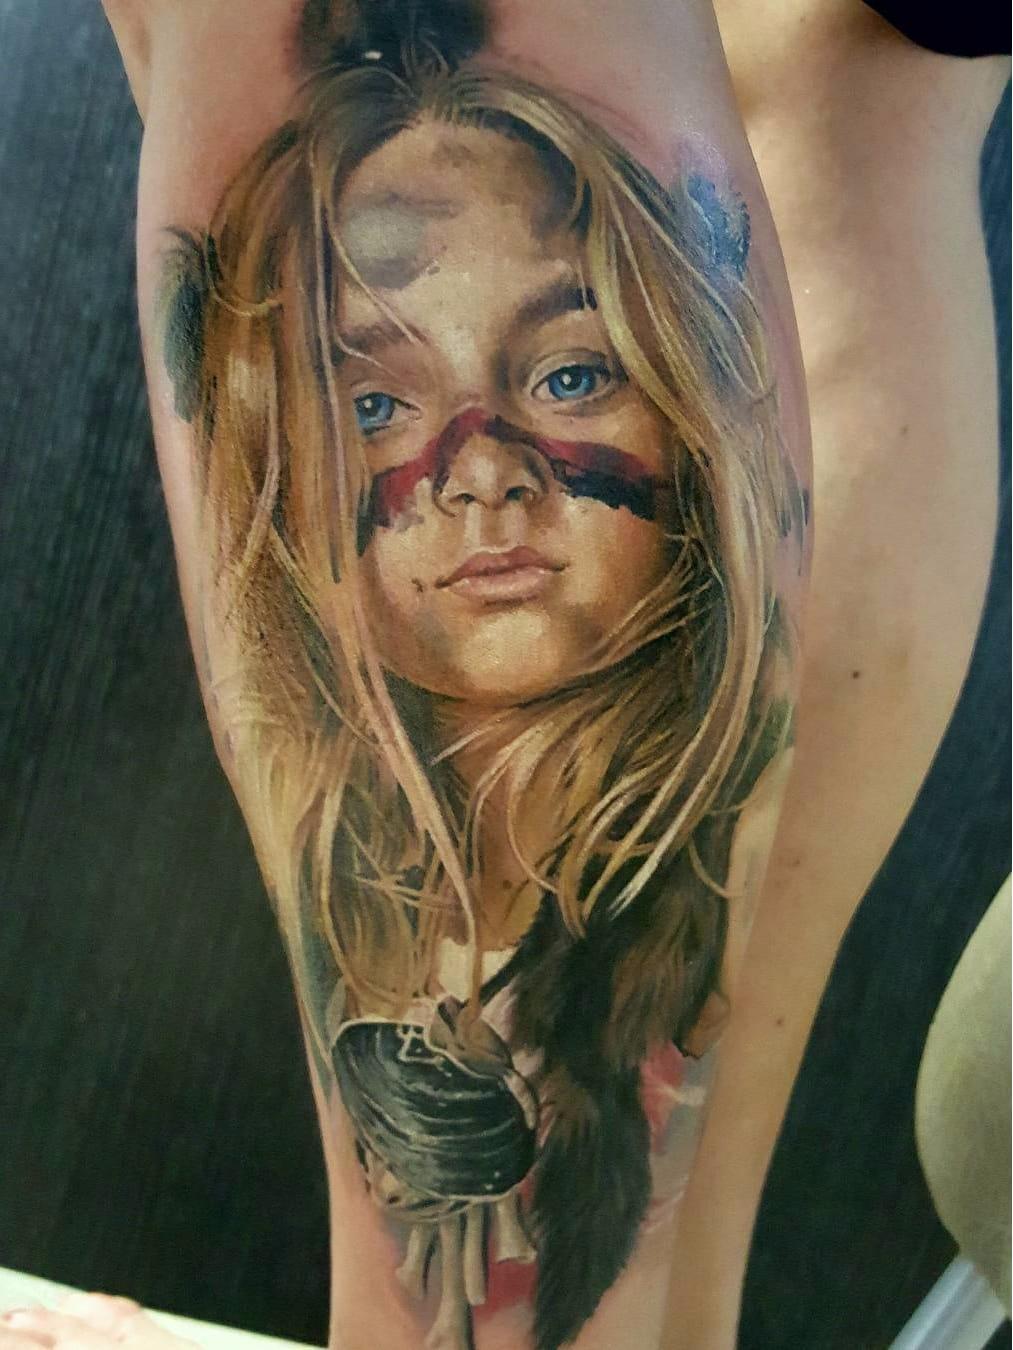 Lindinha #VasilySuvorov #gringo #realismo #realism #realismocolorido #child #kid #criança #girl #menina #garota #portrait #retrato #native #nativa